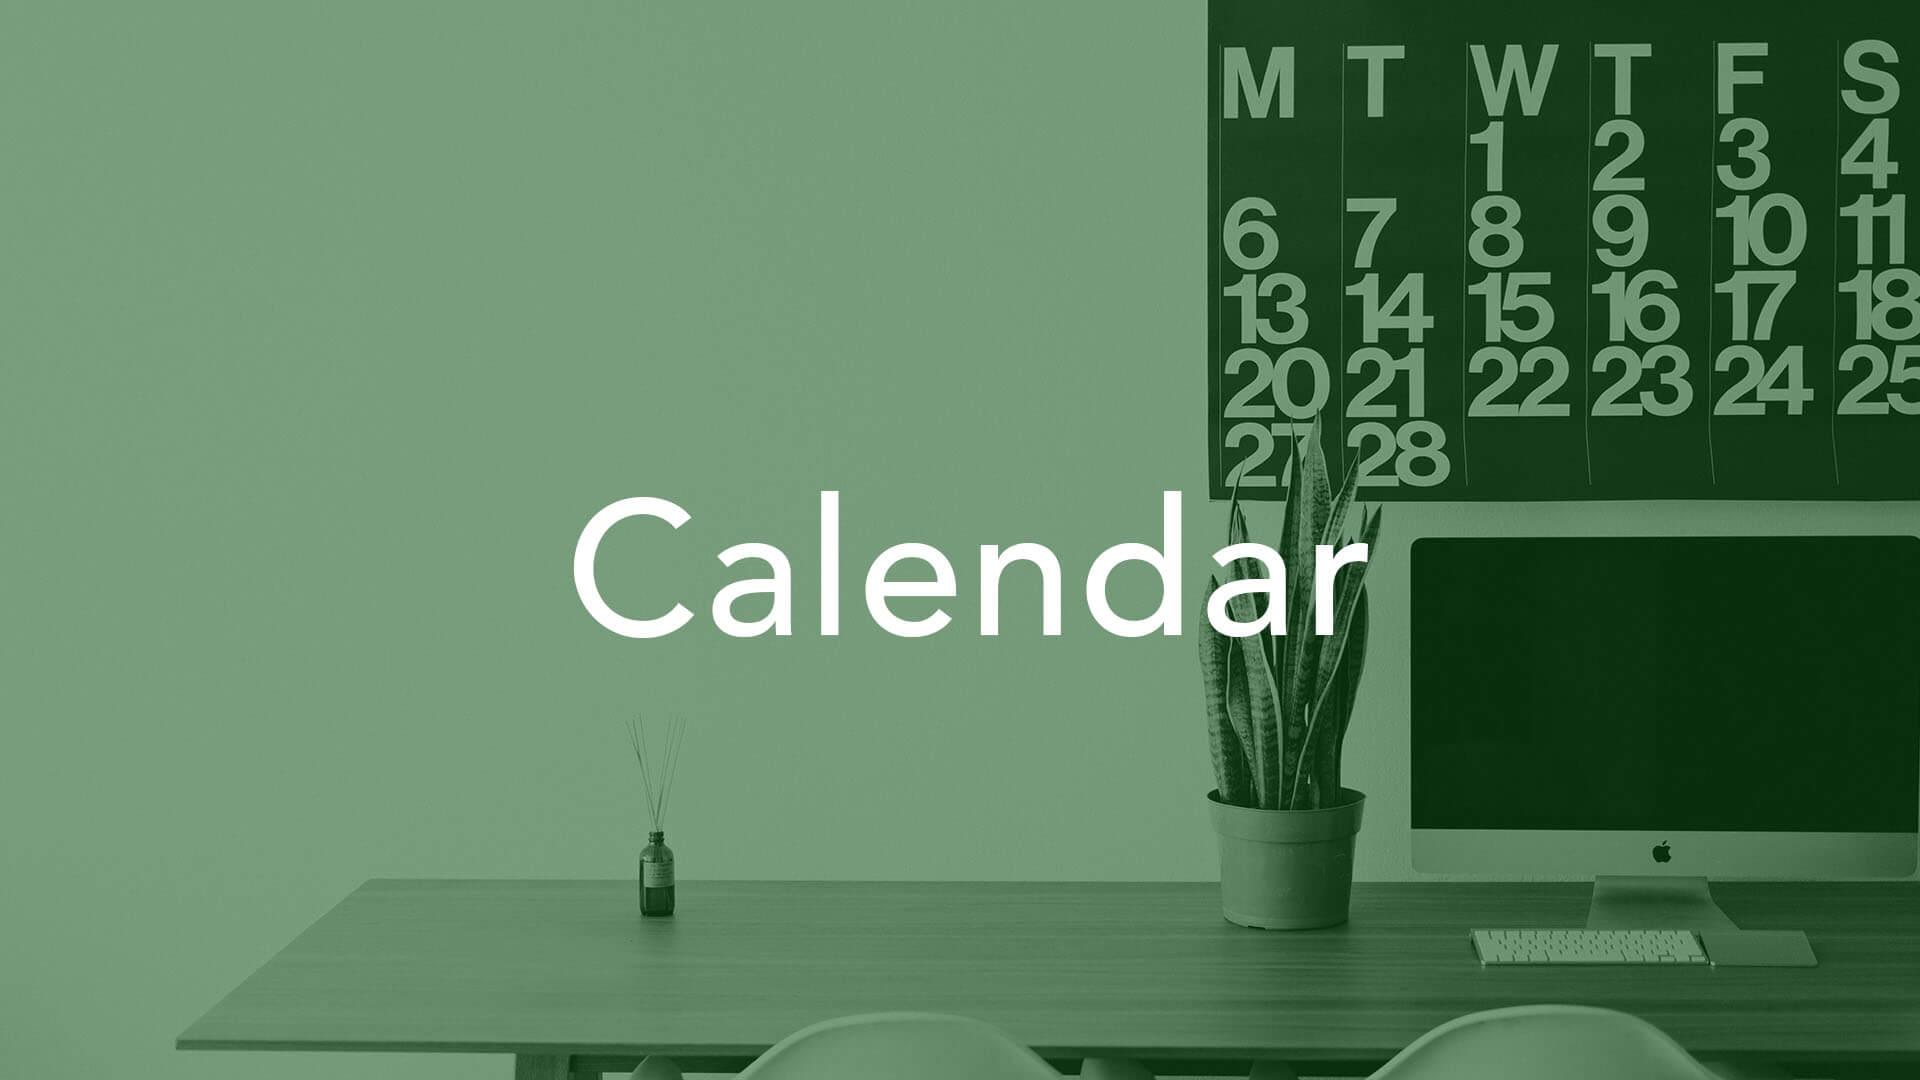 Calendarlight